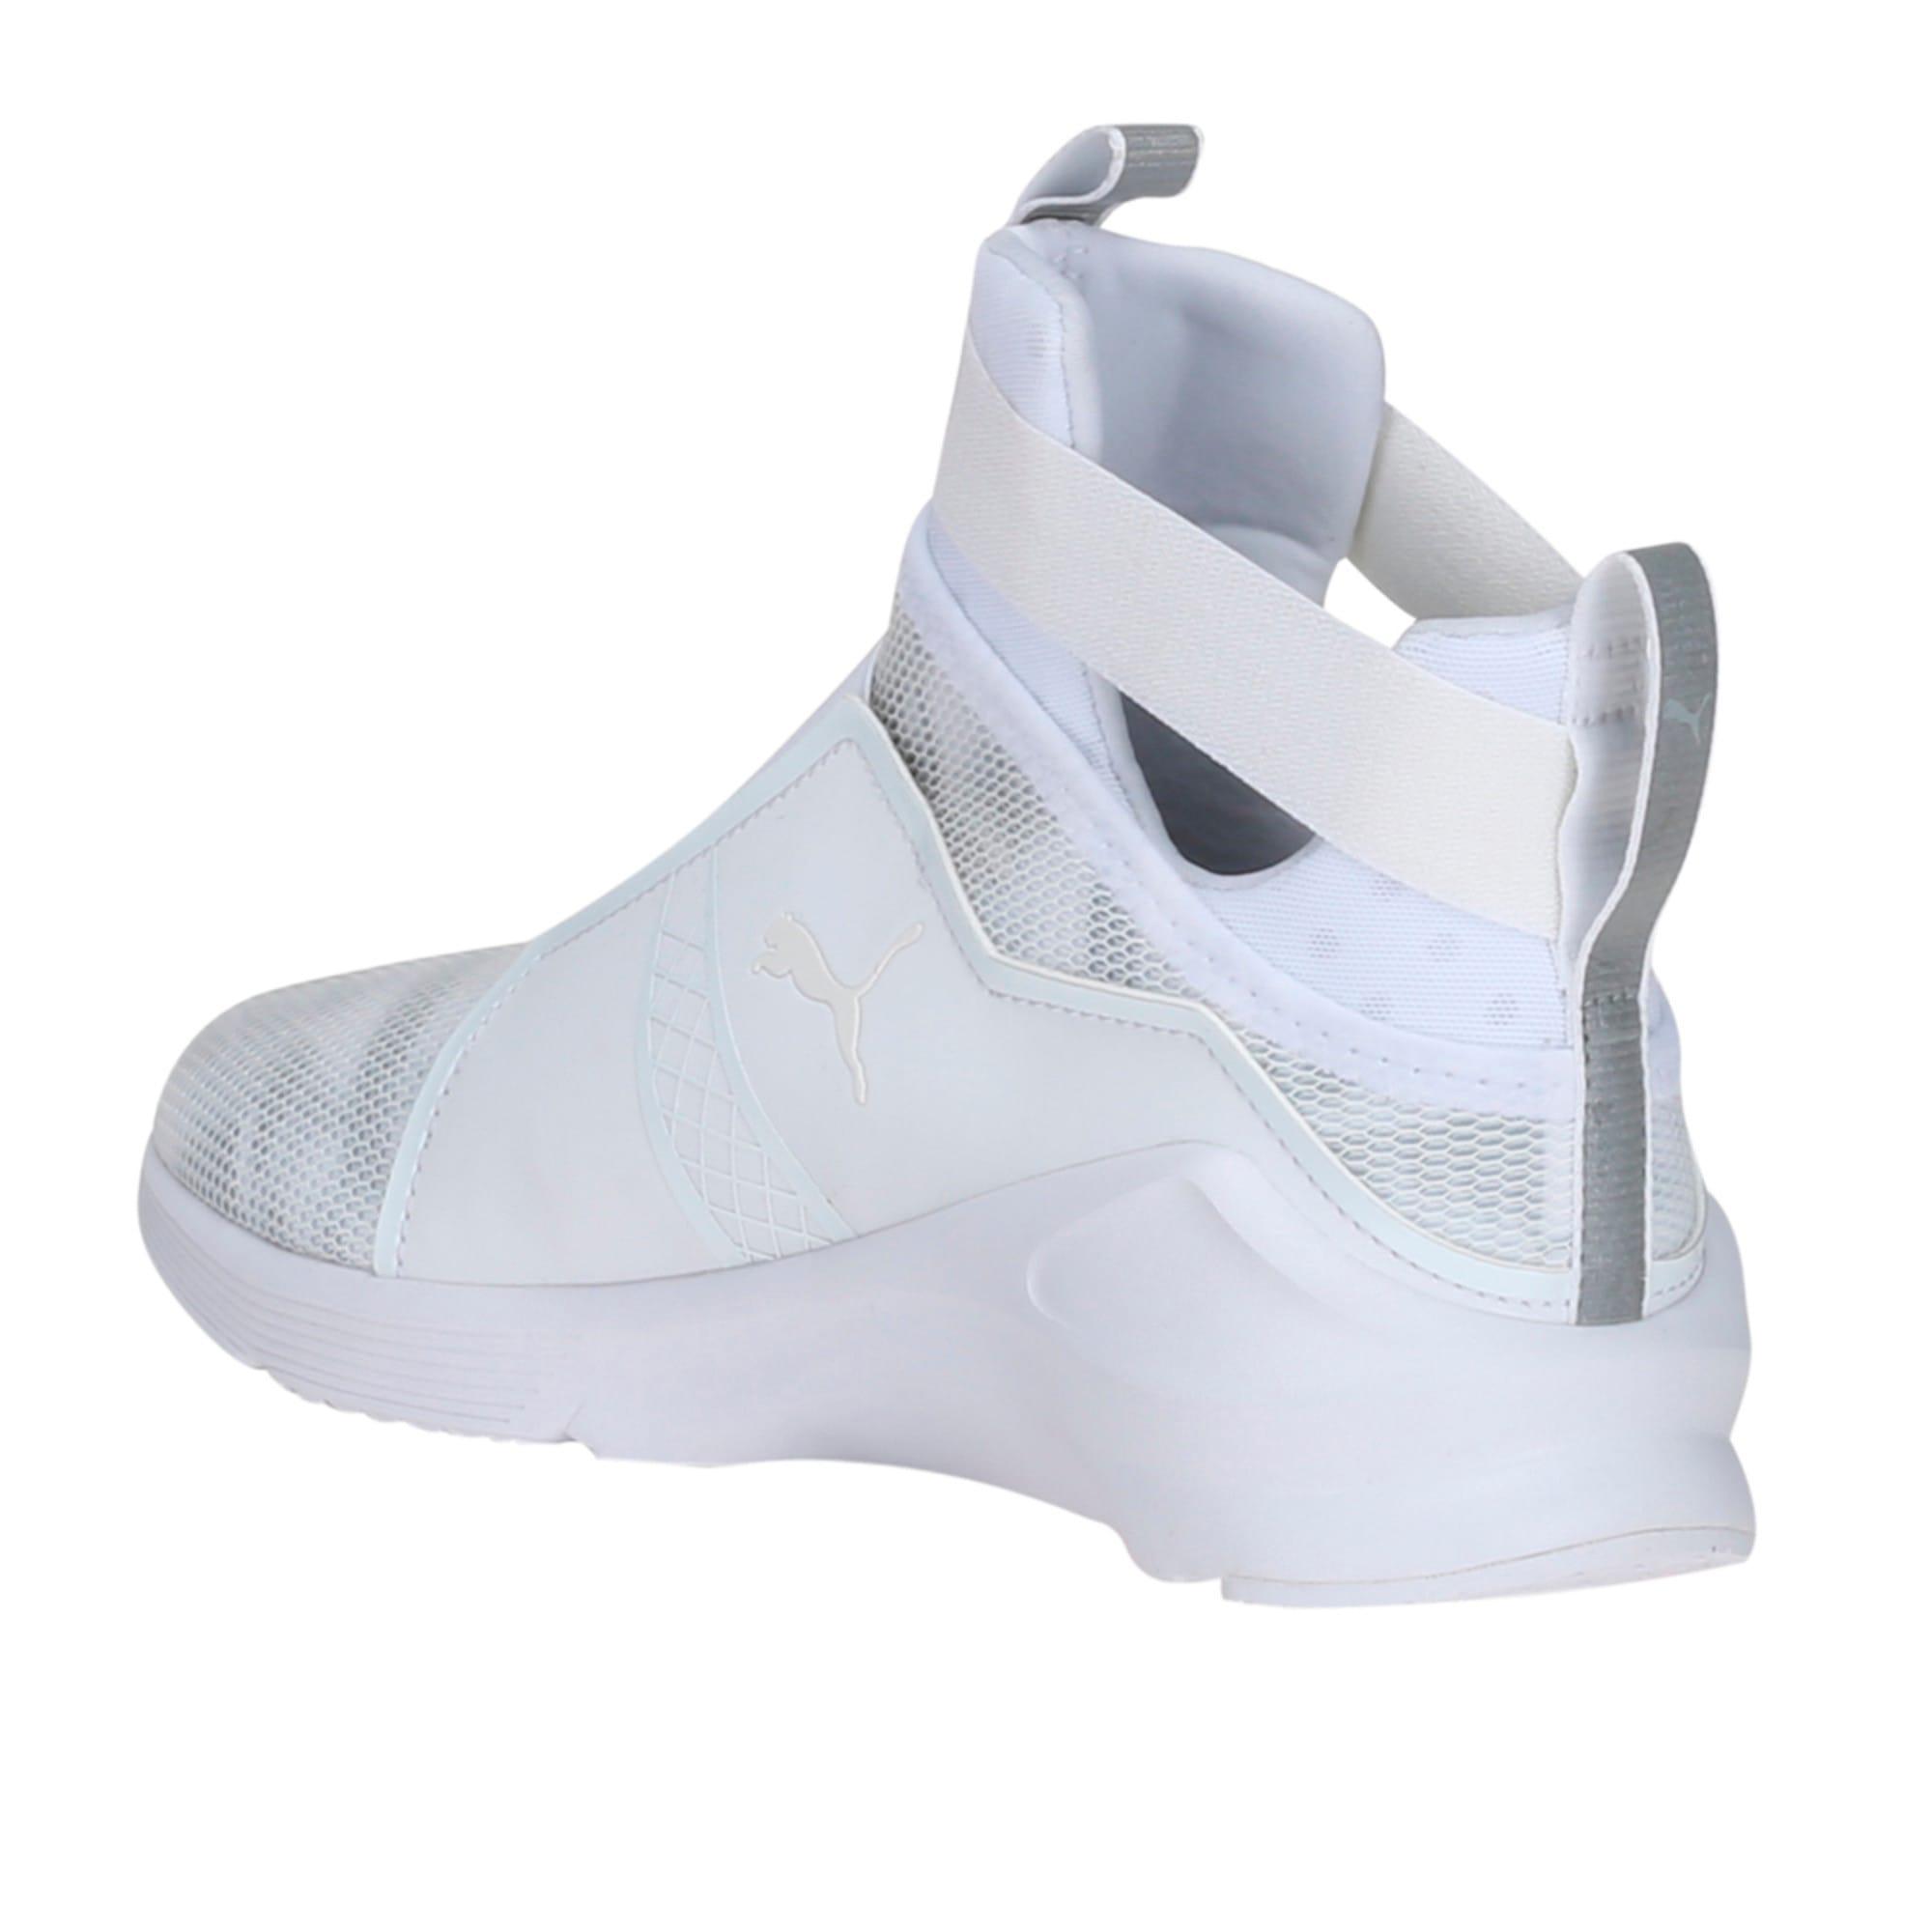 Thumbnail 3 of PUMA Fierce Swan Training Shoes, Puma White-Puma White, medium-IND